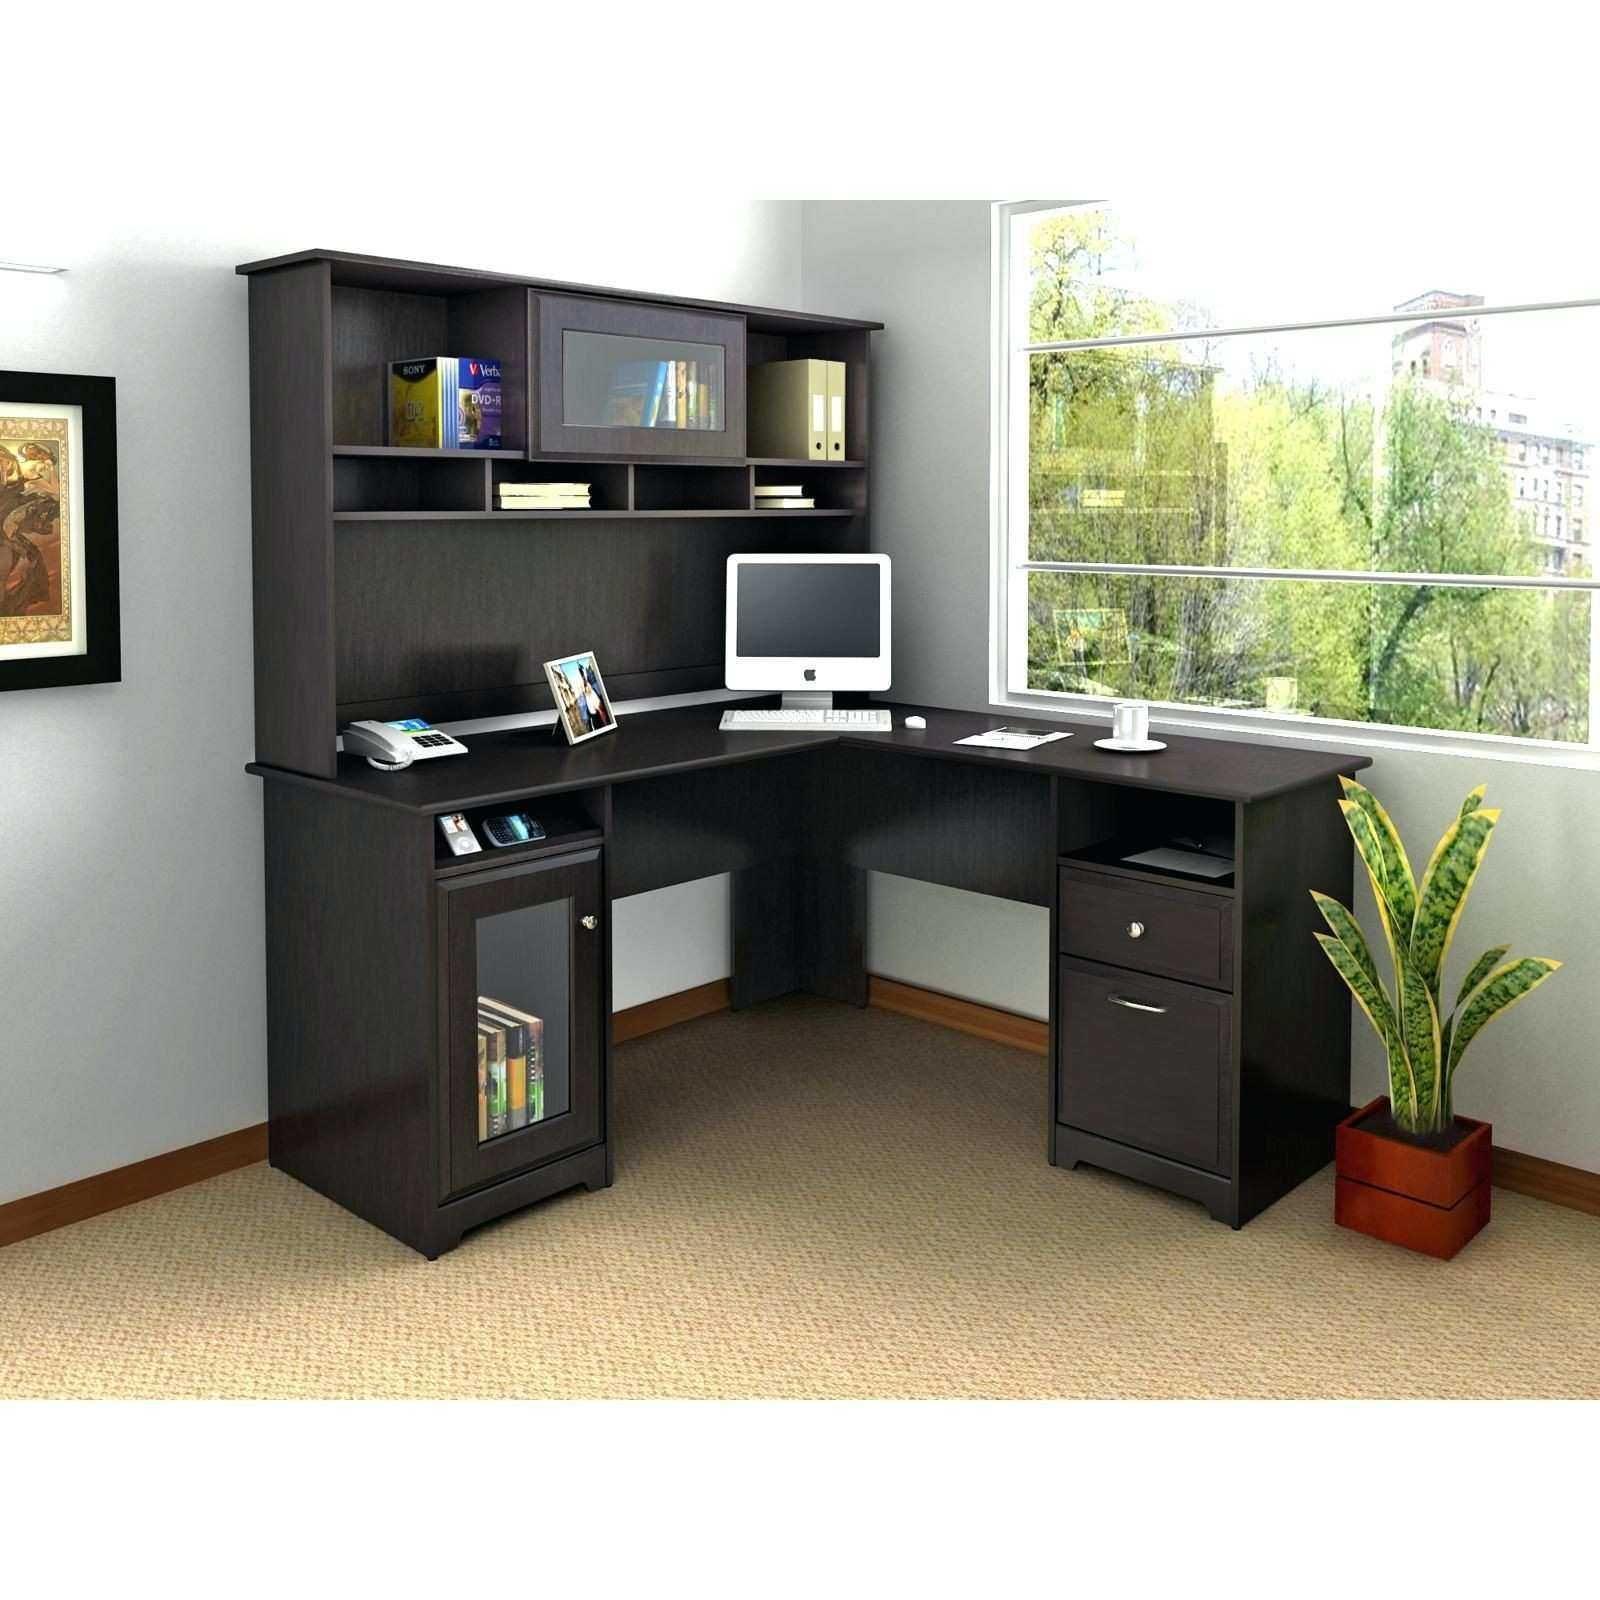 Pin On Corner Desk Ideas